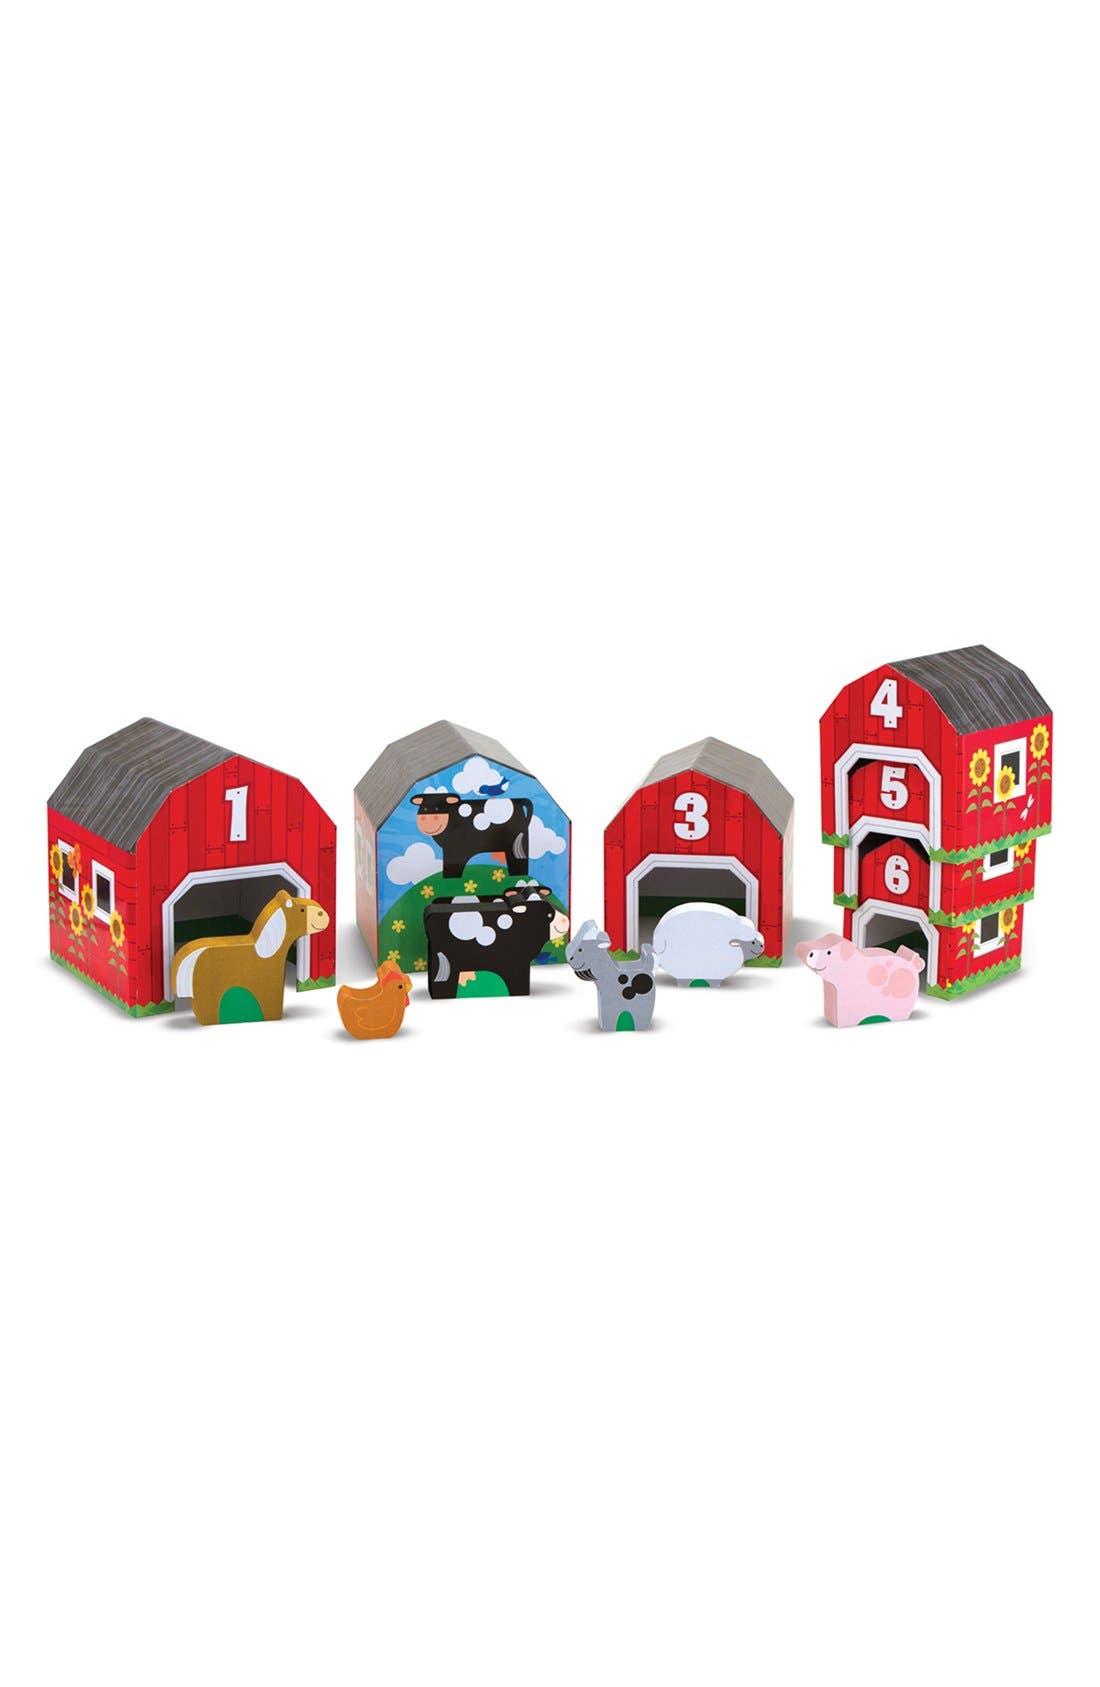 Alternate Image 1 Selected - Melissa & Doug Nesting Barns & Animals Toy